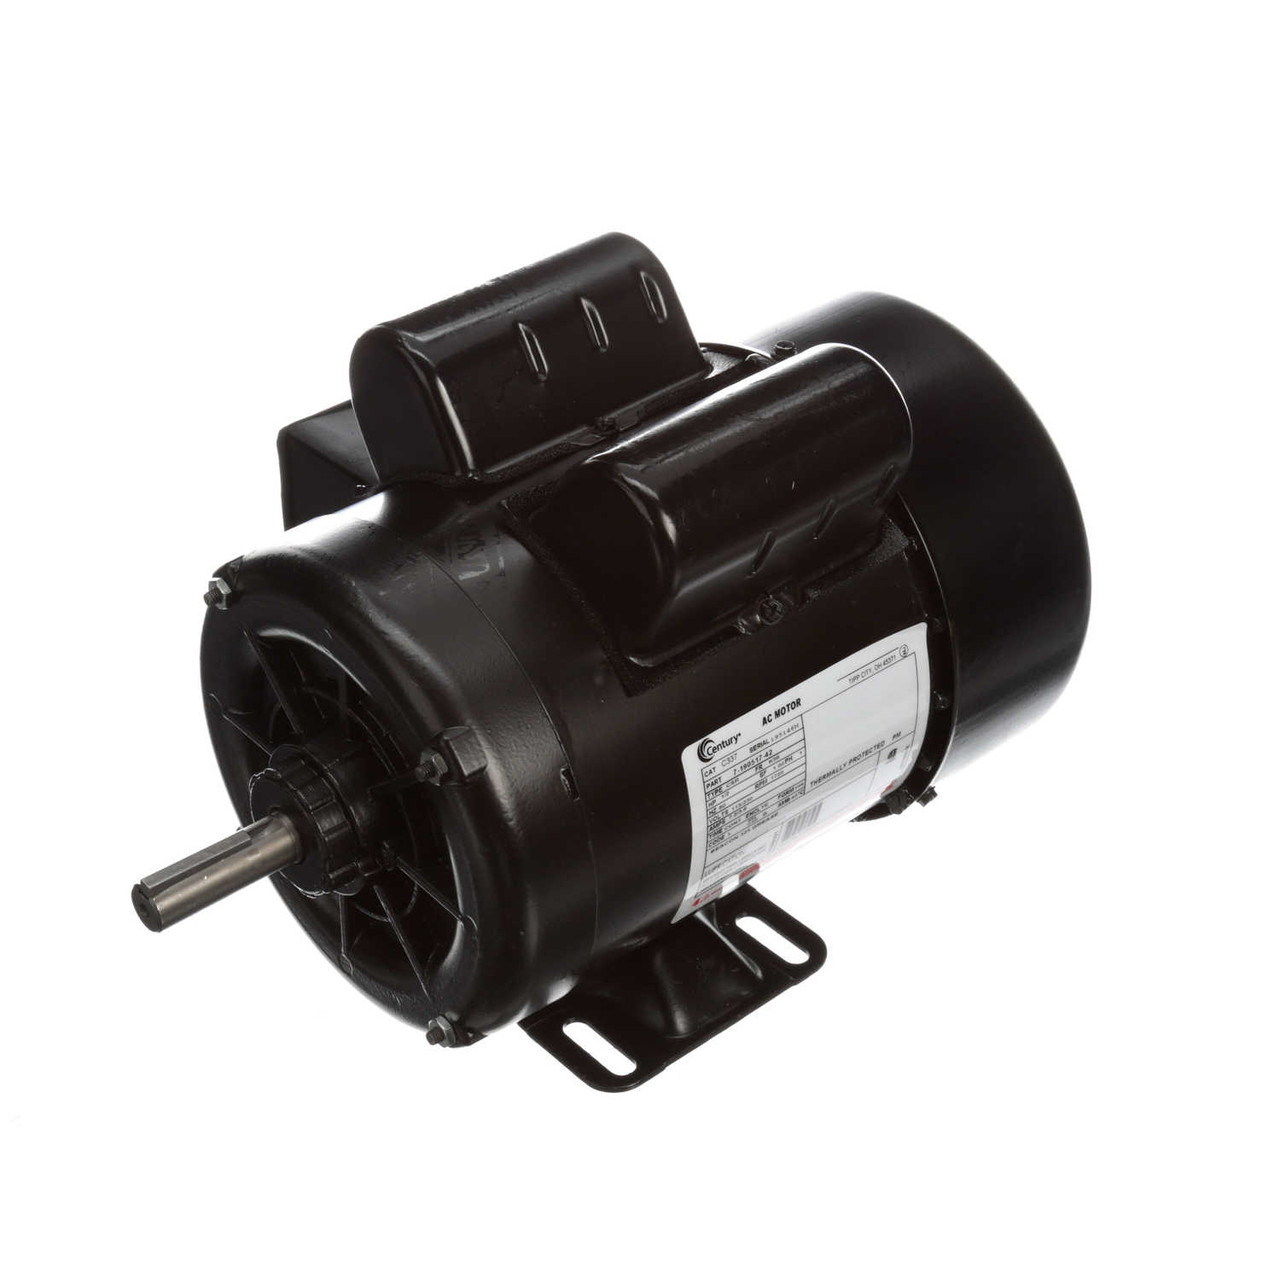 C337 Single Phase Capacitor Start TEFC Rigid Base Motor 1/2 HP